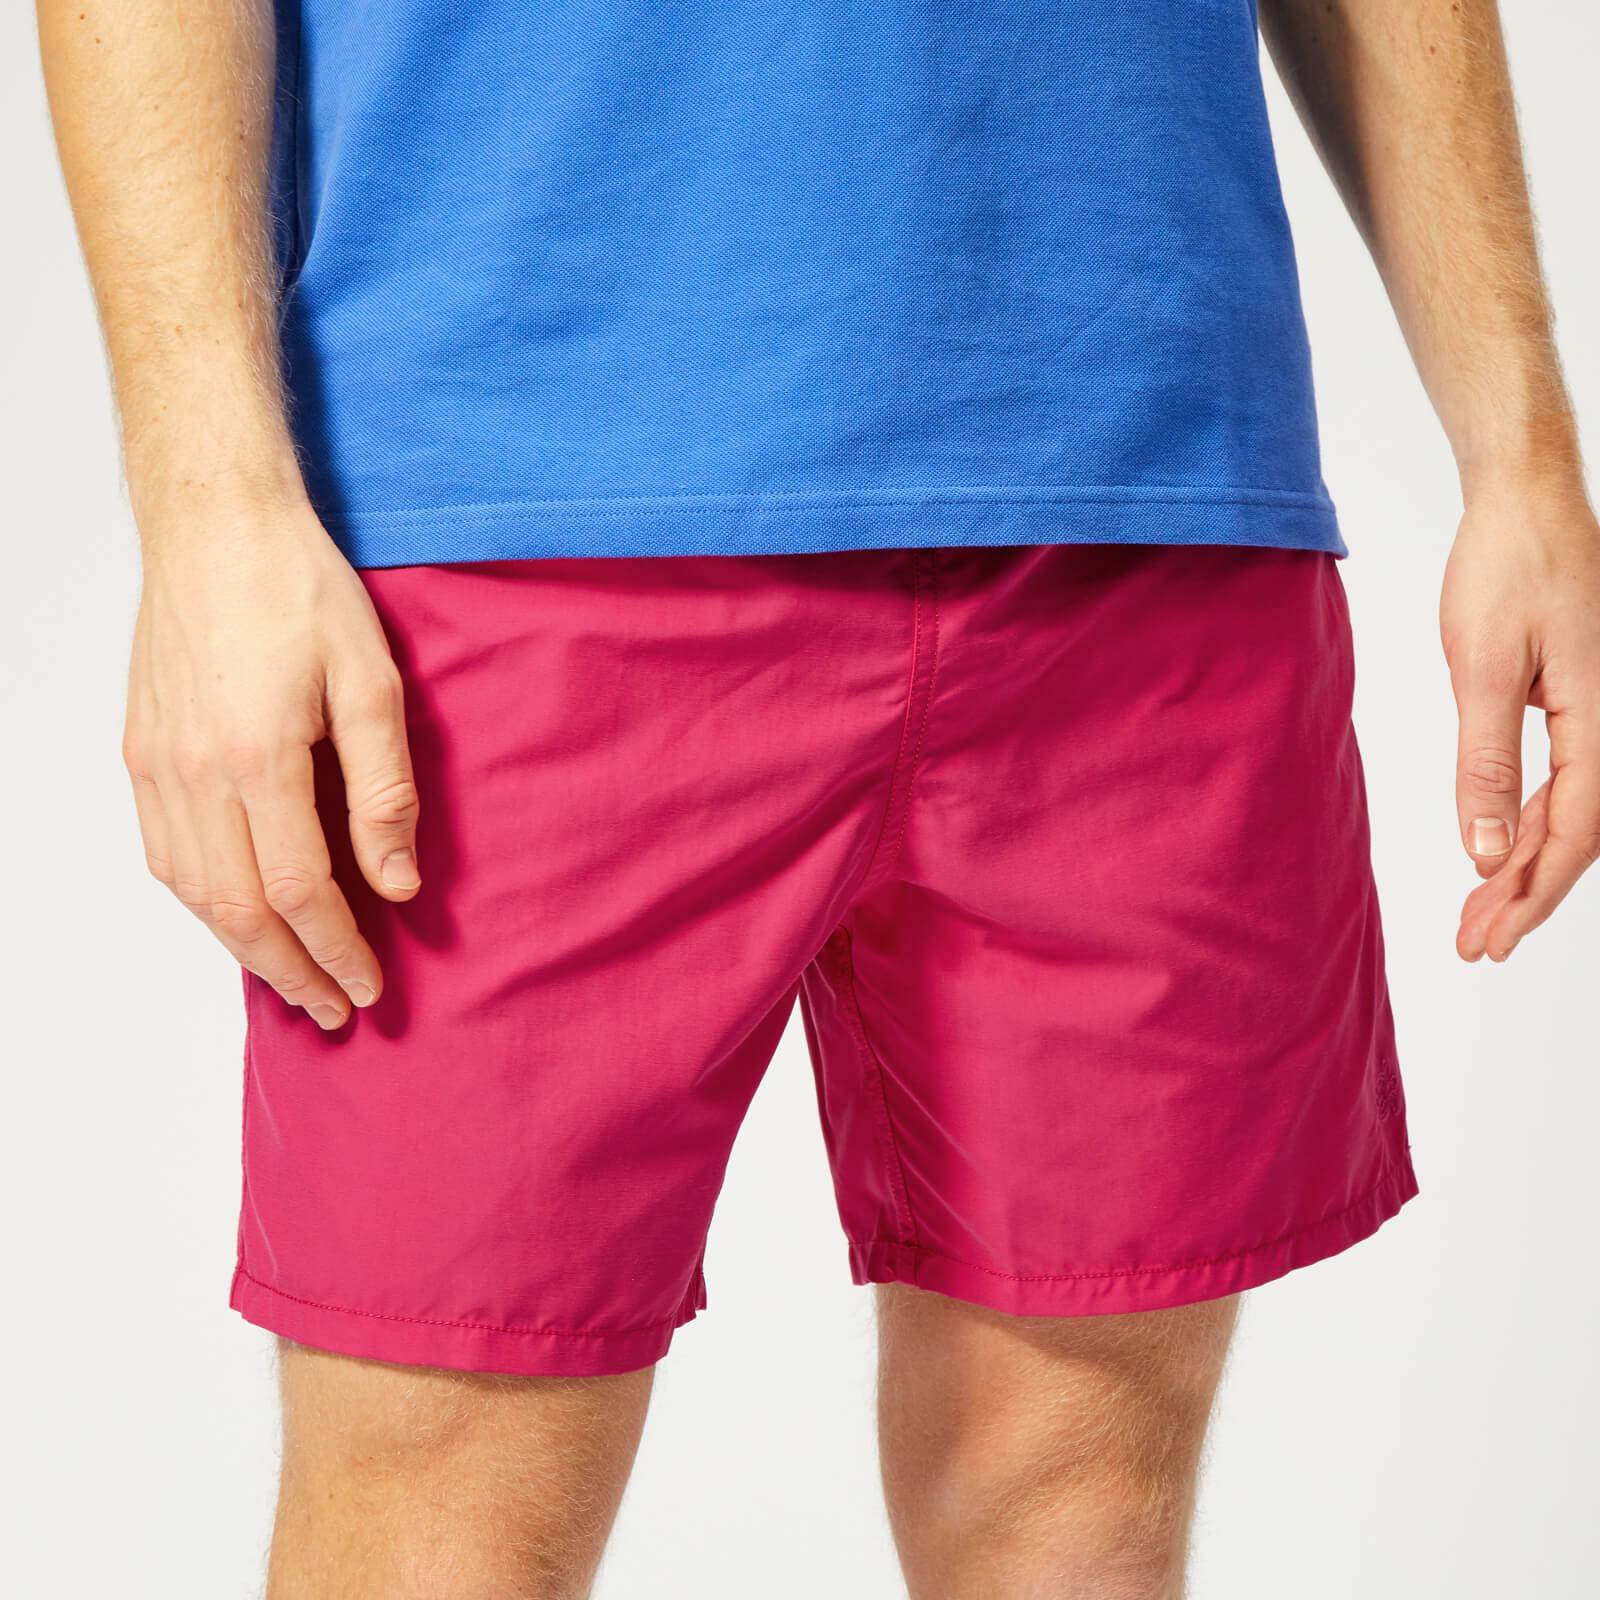 be5d9d7816 Vilebrequin Men's Moorea Water Reactive Swim Shorts - Gooseberry Red - Free  UK Delivery over £50